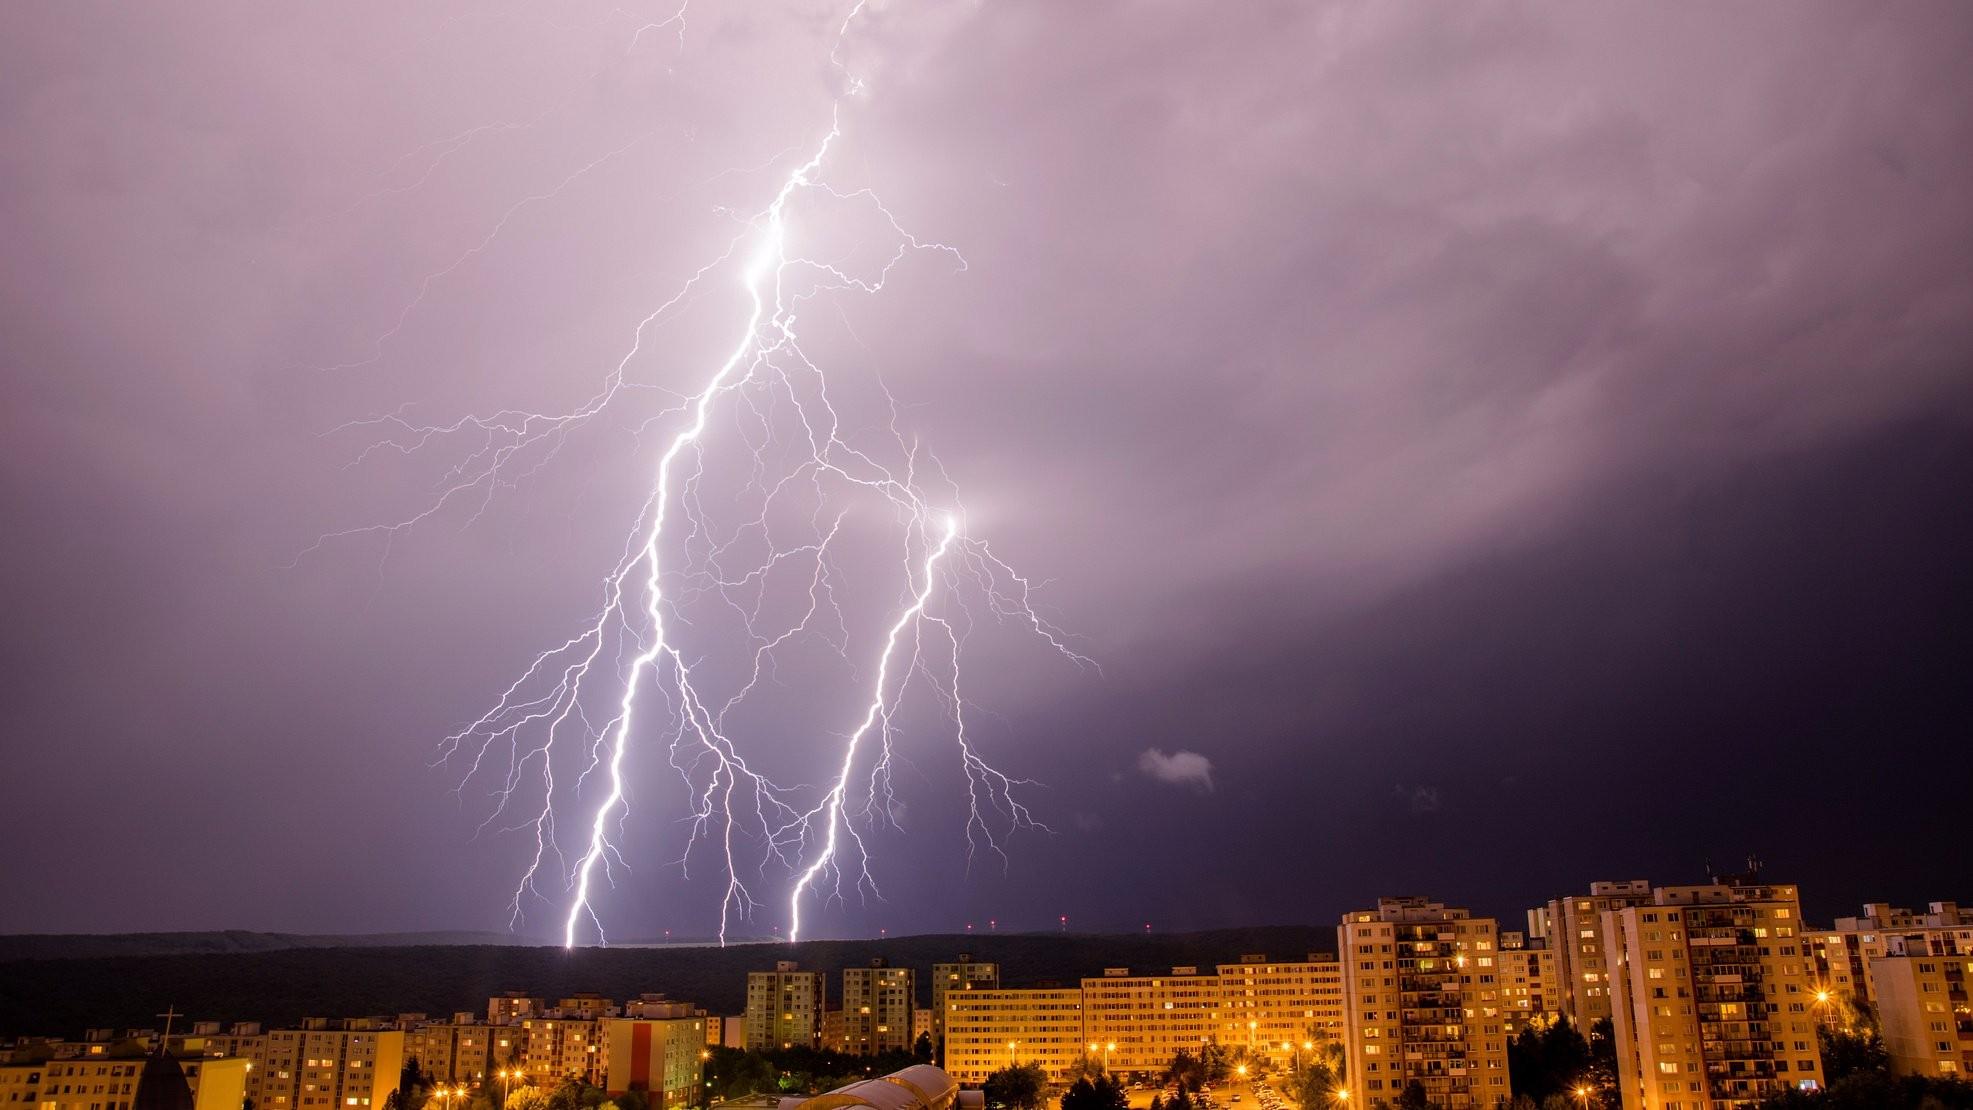 Blesky pri búrke nad Košicami